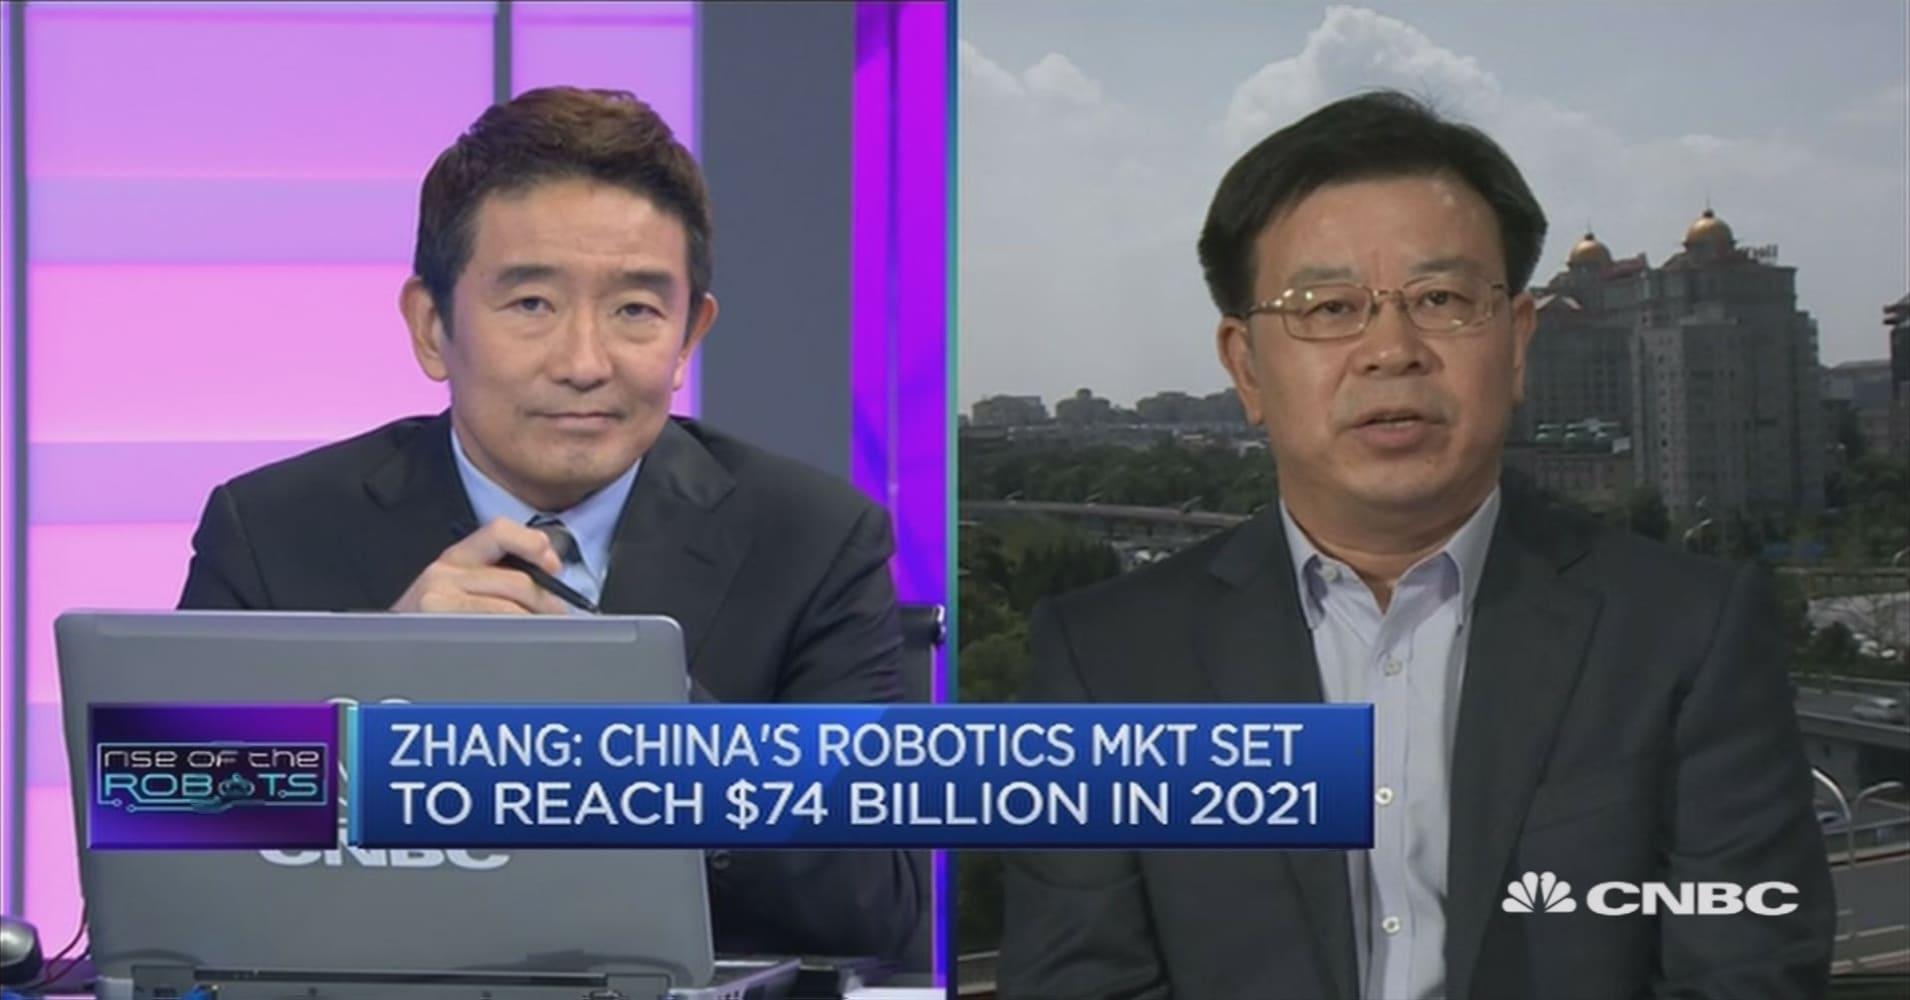 Chinas blueprint to crush the us robotics industry health care malvernweather Choice Image